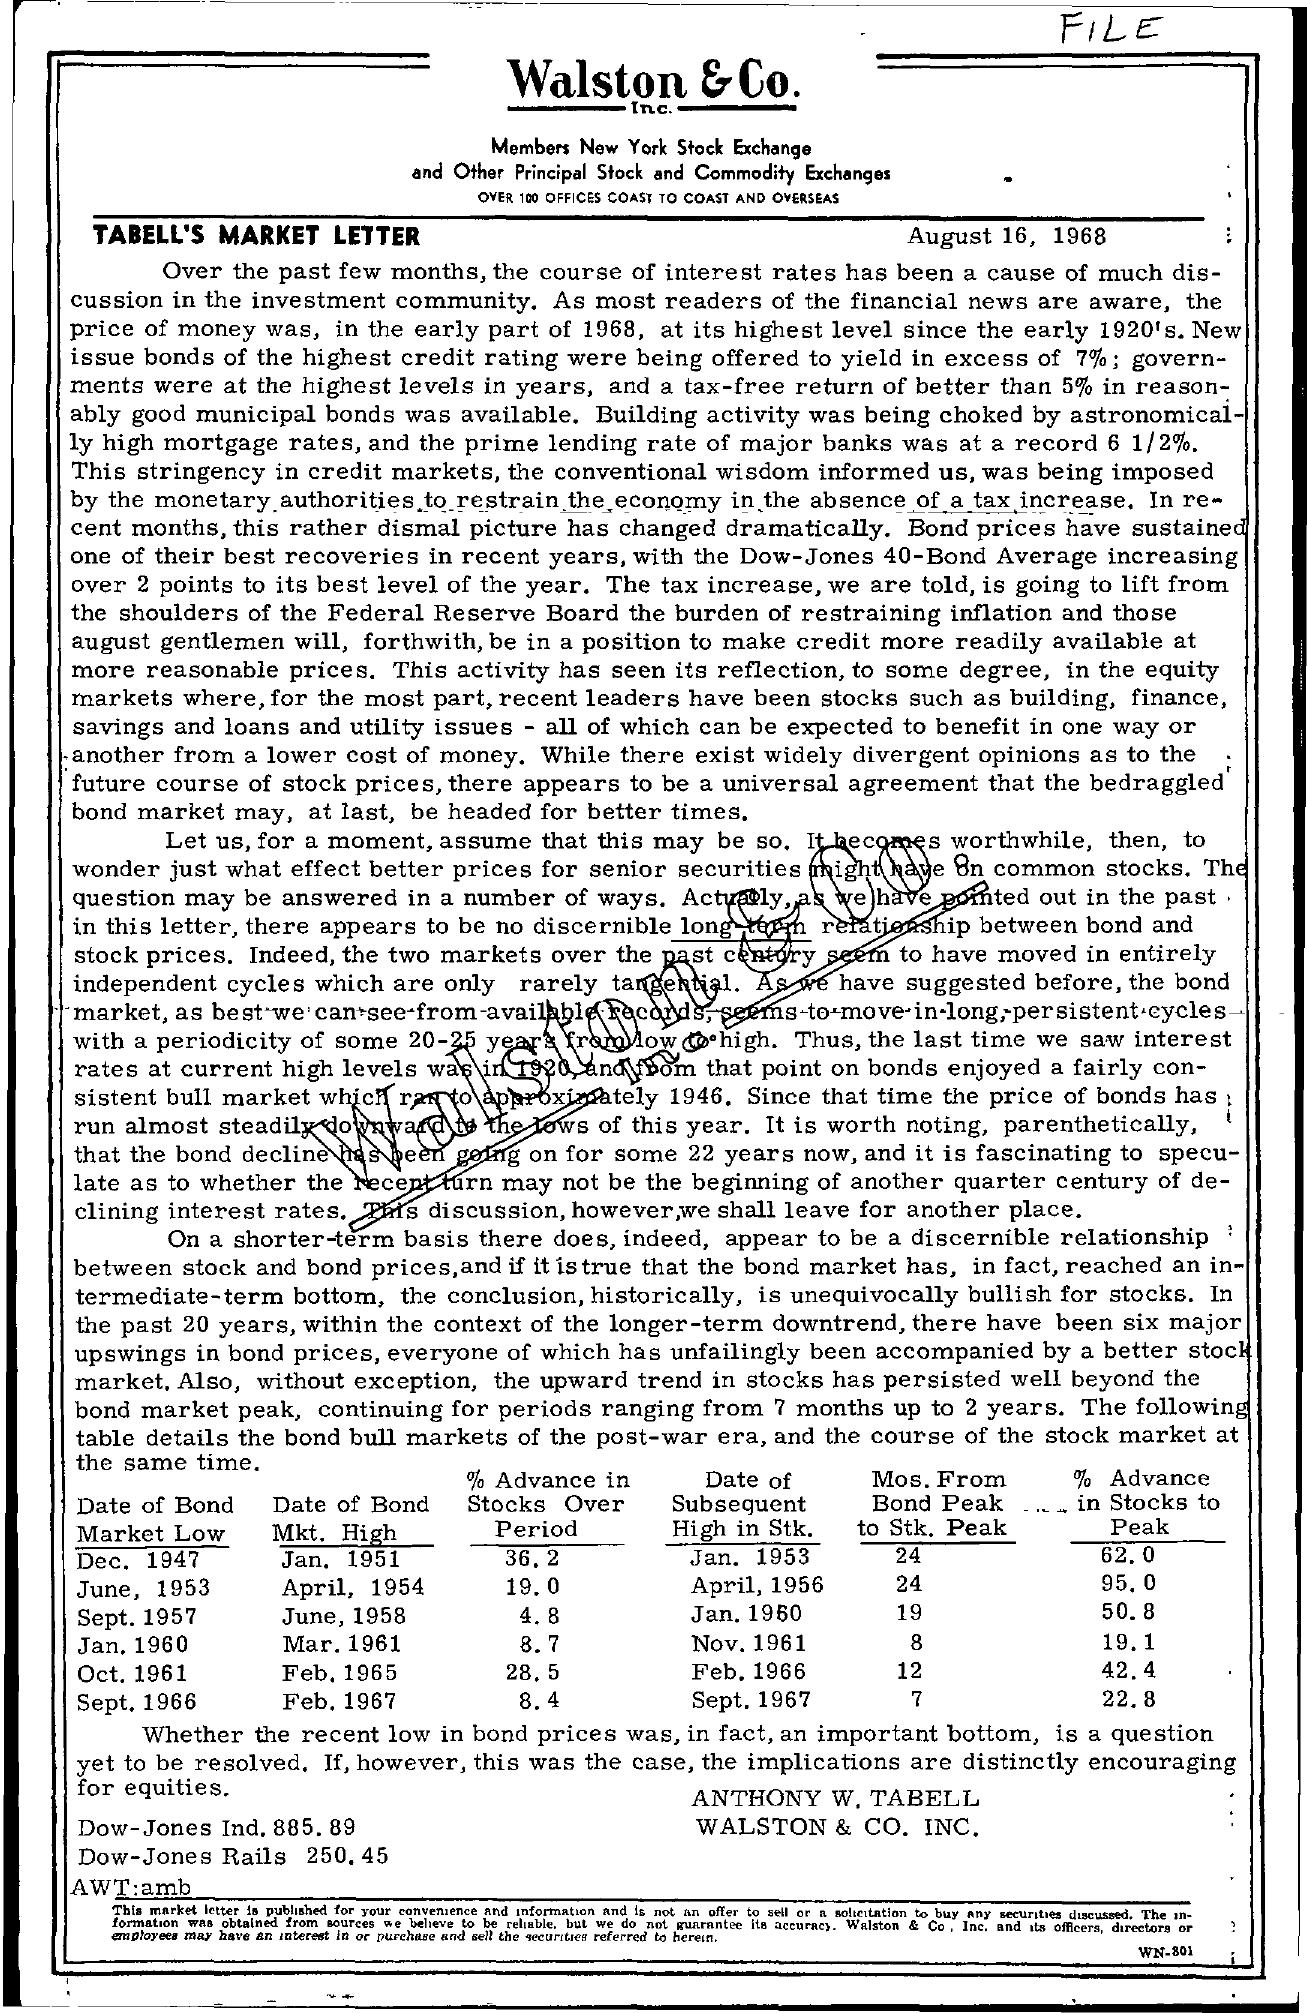 Tabell's Market Letter - August 16, 1968